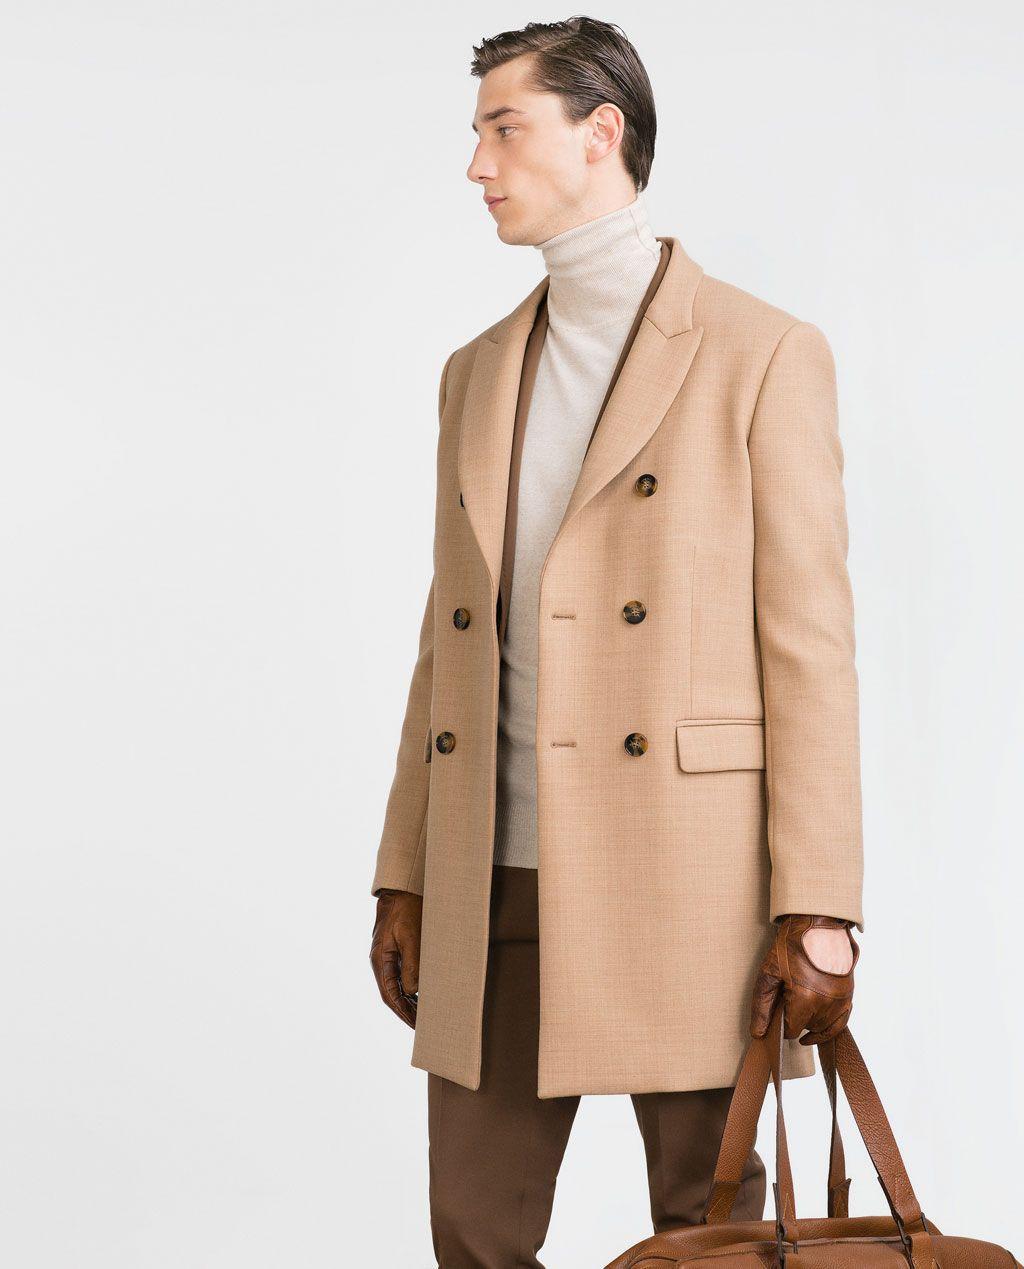 Manteau Croisé Homme Pinterest Wpbqz4 Dapper Shopping Zara List eIDWH2E9Y